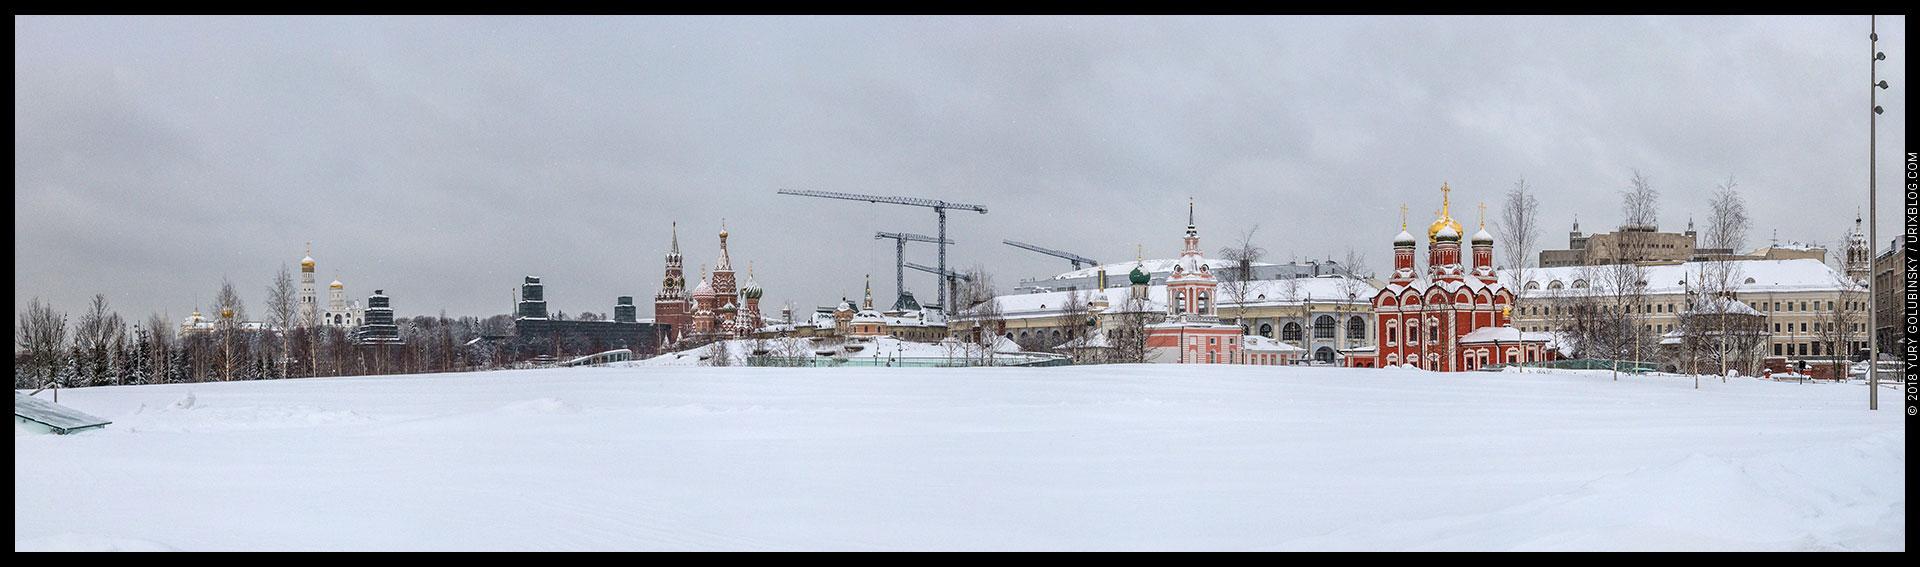 парк Зарядье, Москва, Россия, 2018, зима, снег, утро, безлюдно, панорама